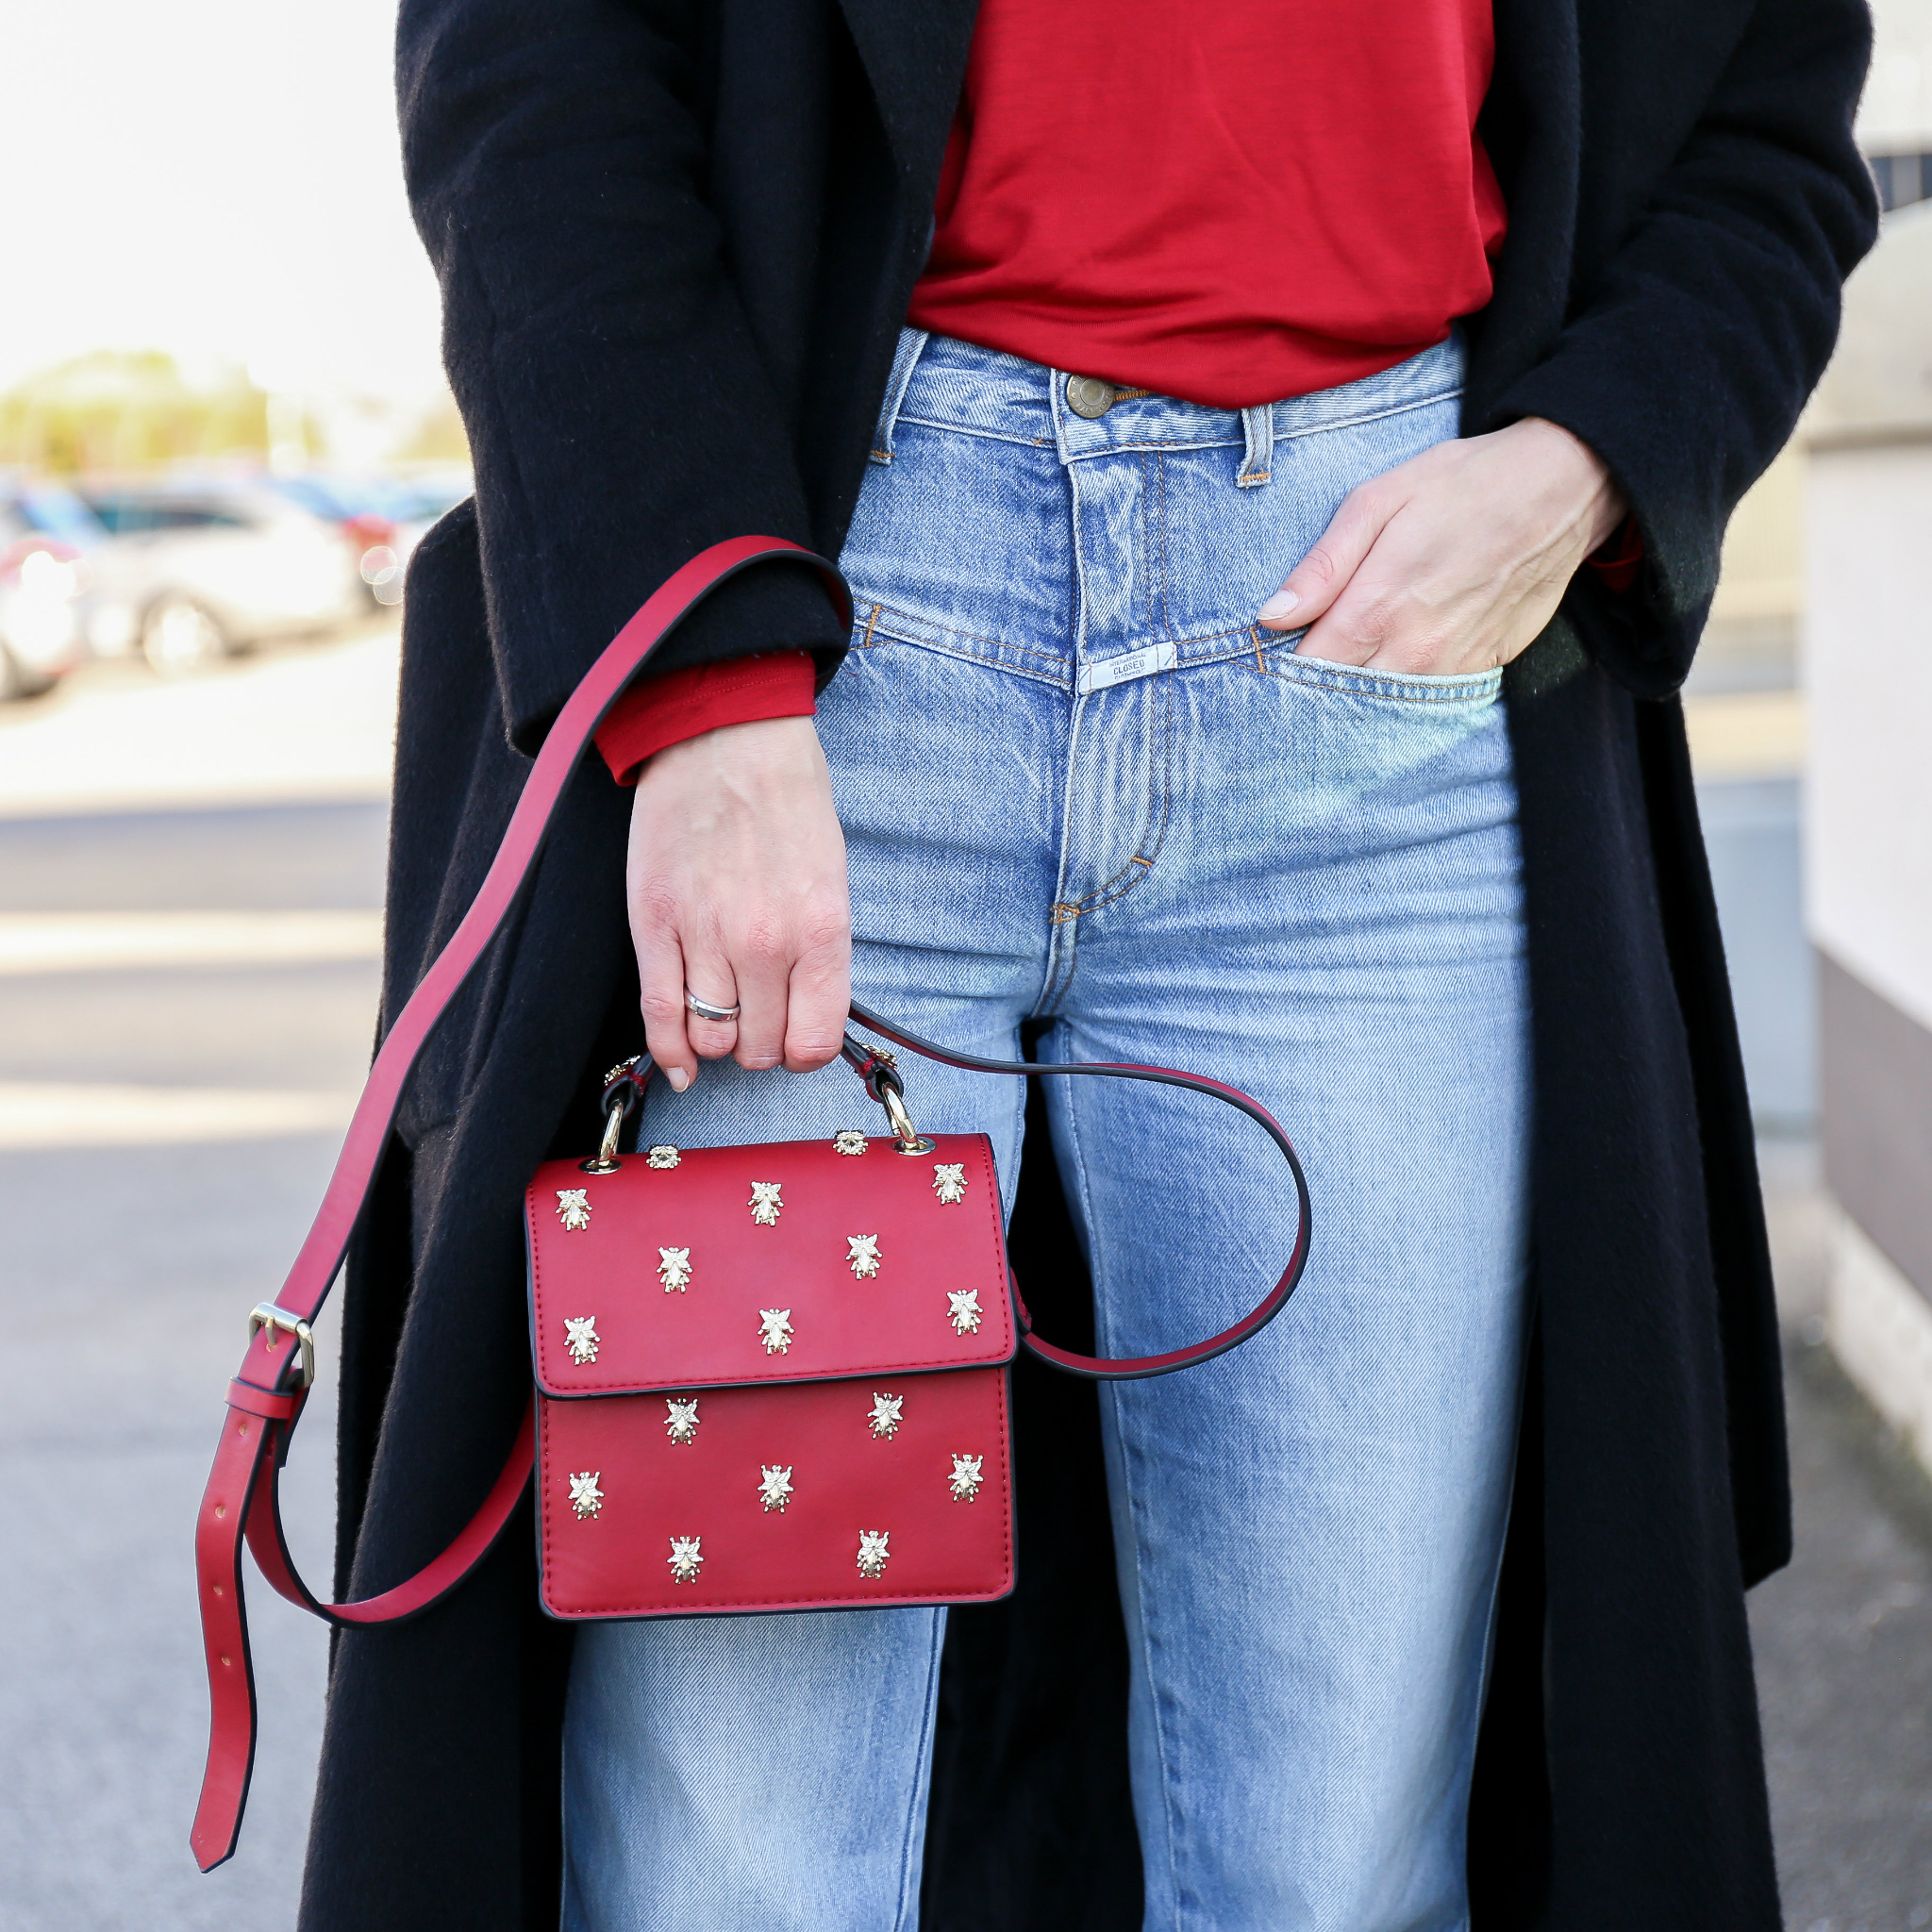 MOD-by-Monique-Fashion-Looks-Closed-Tiny-Beetle-Bag-29